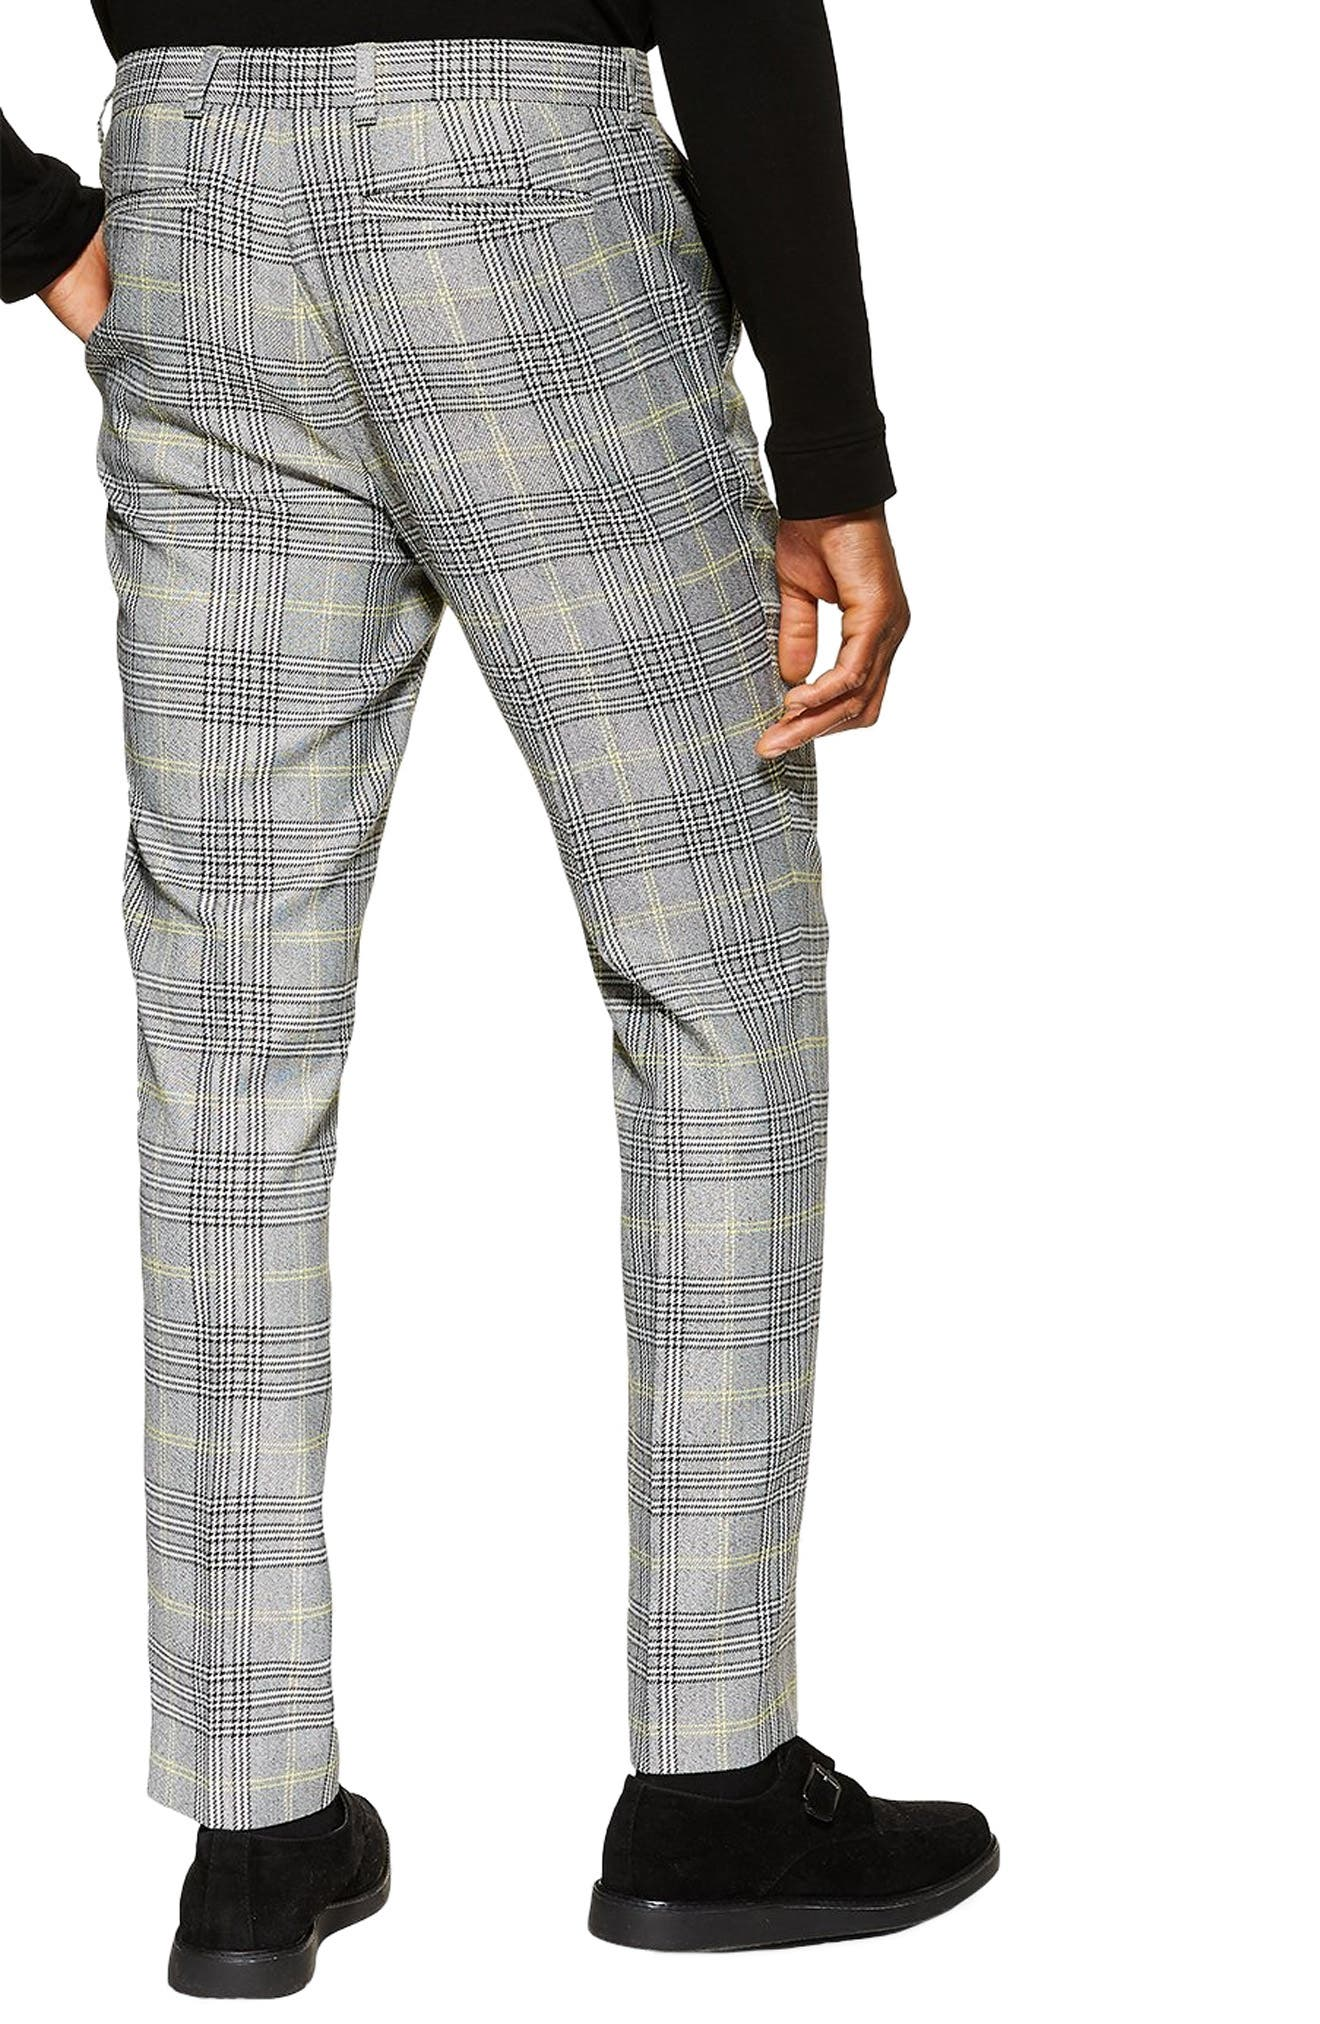 TOPMAN, Check Slim Trousers, Alternate thumbnail 2, color, GREY